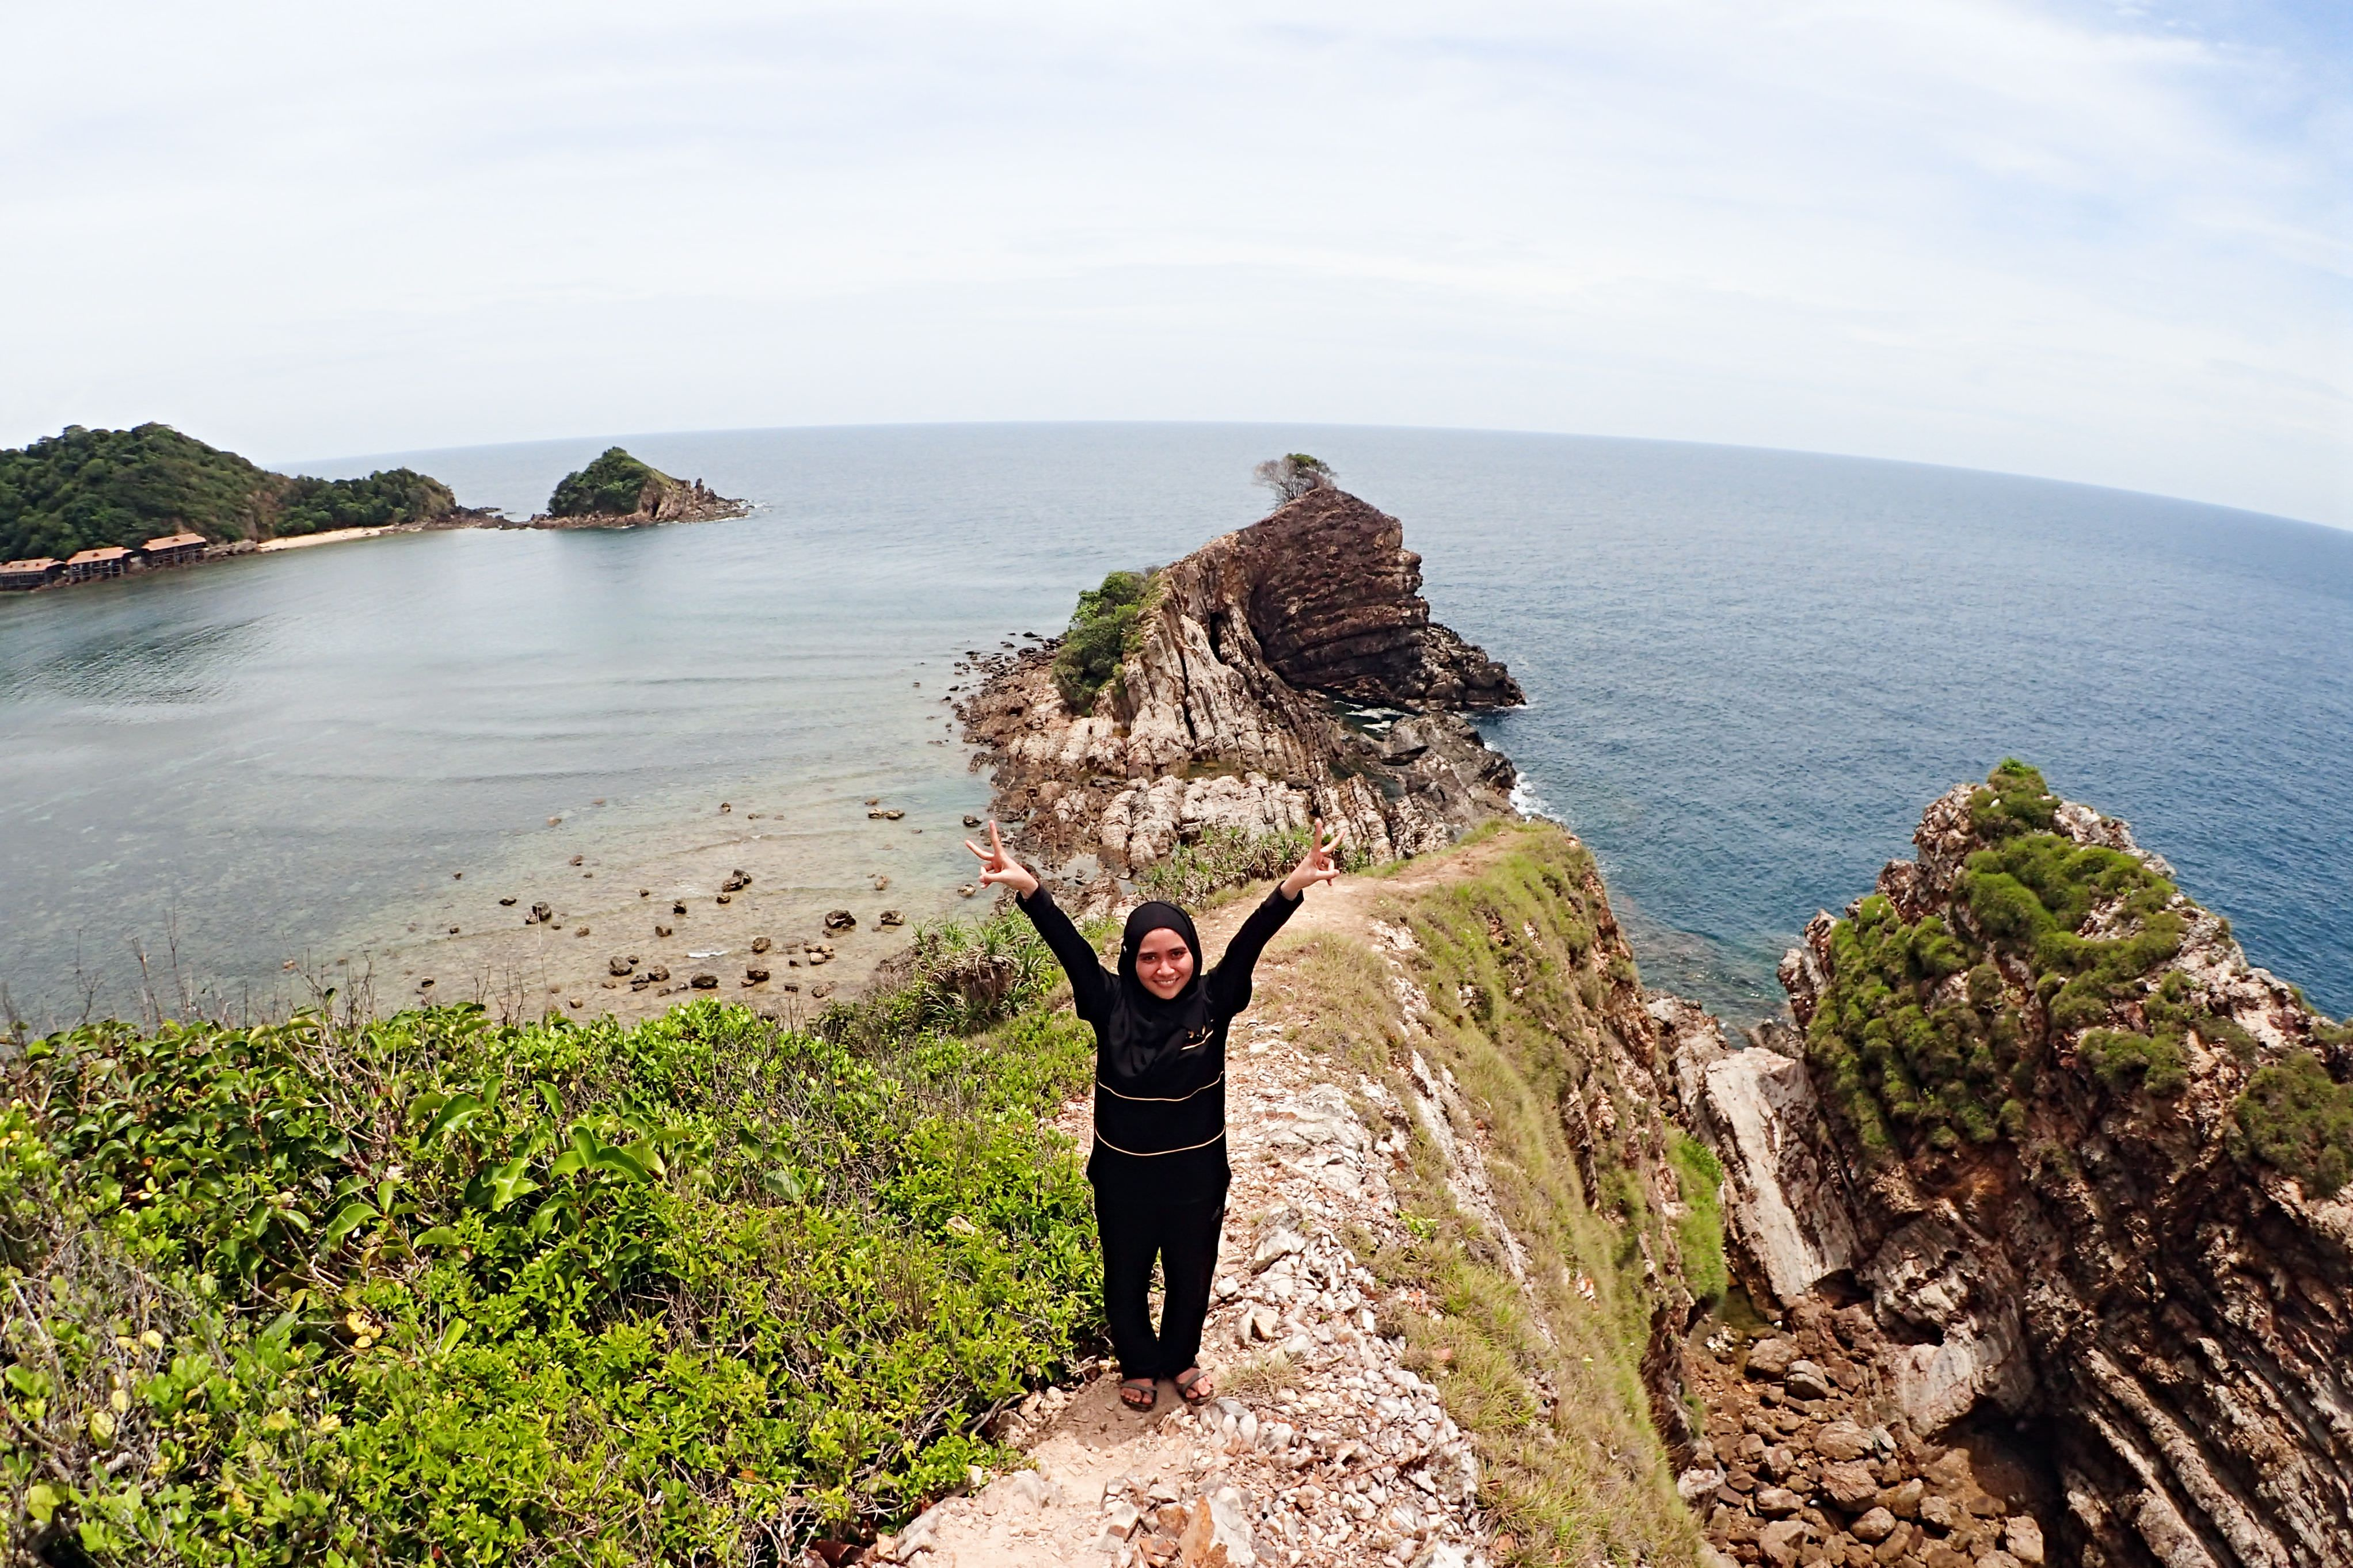 Pulau kapas 12